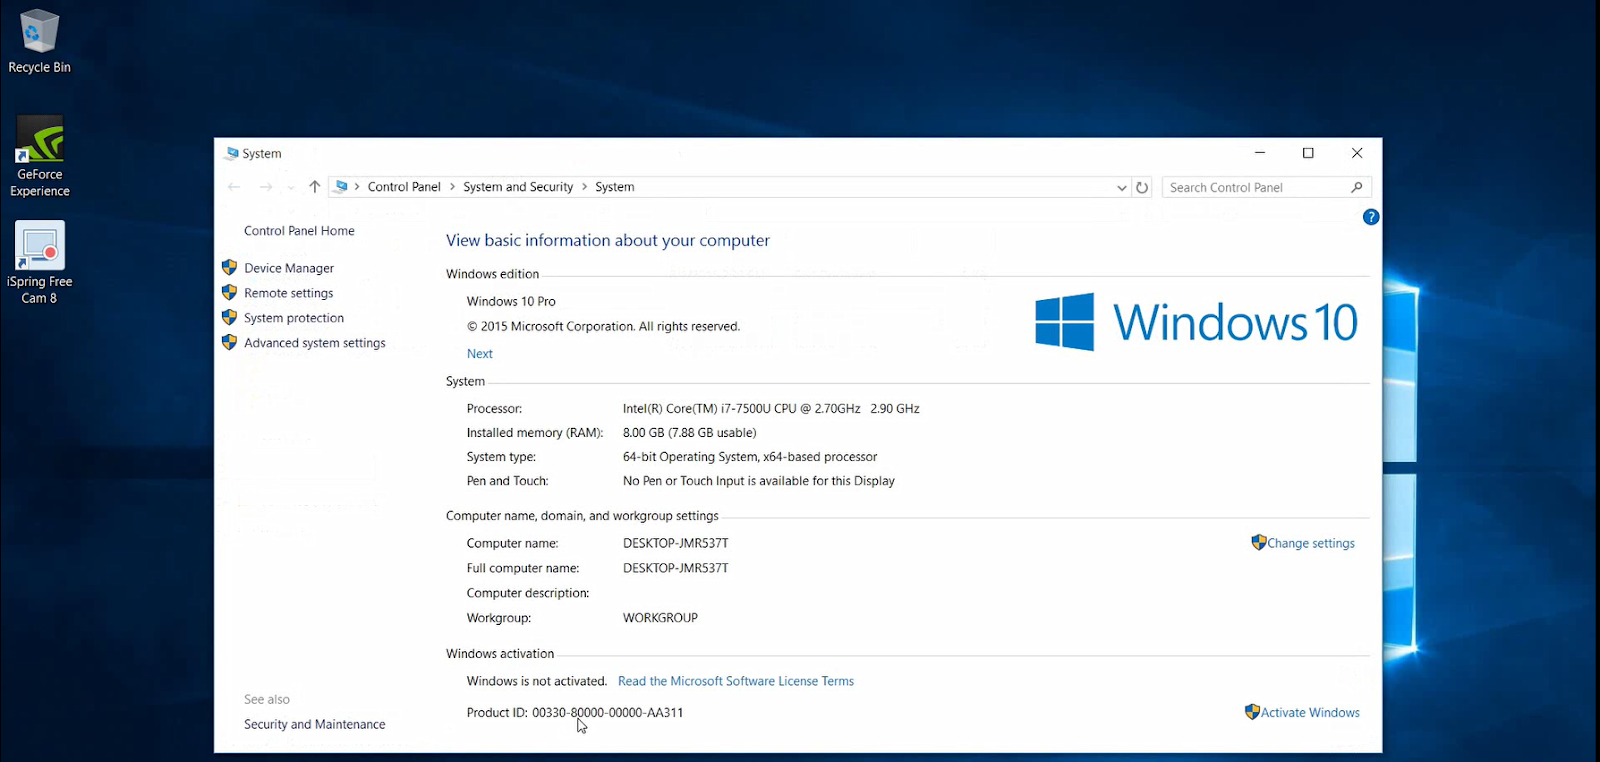 windows 10 activator download 64 bit rar